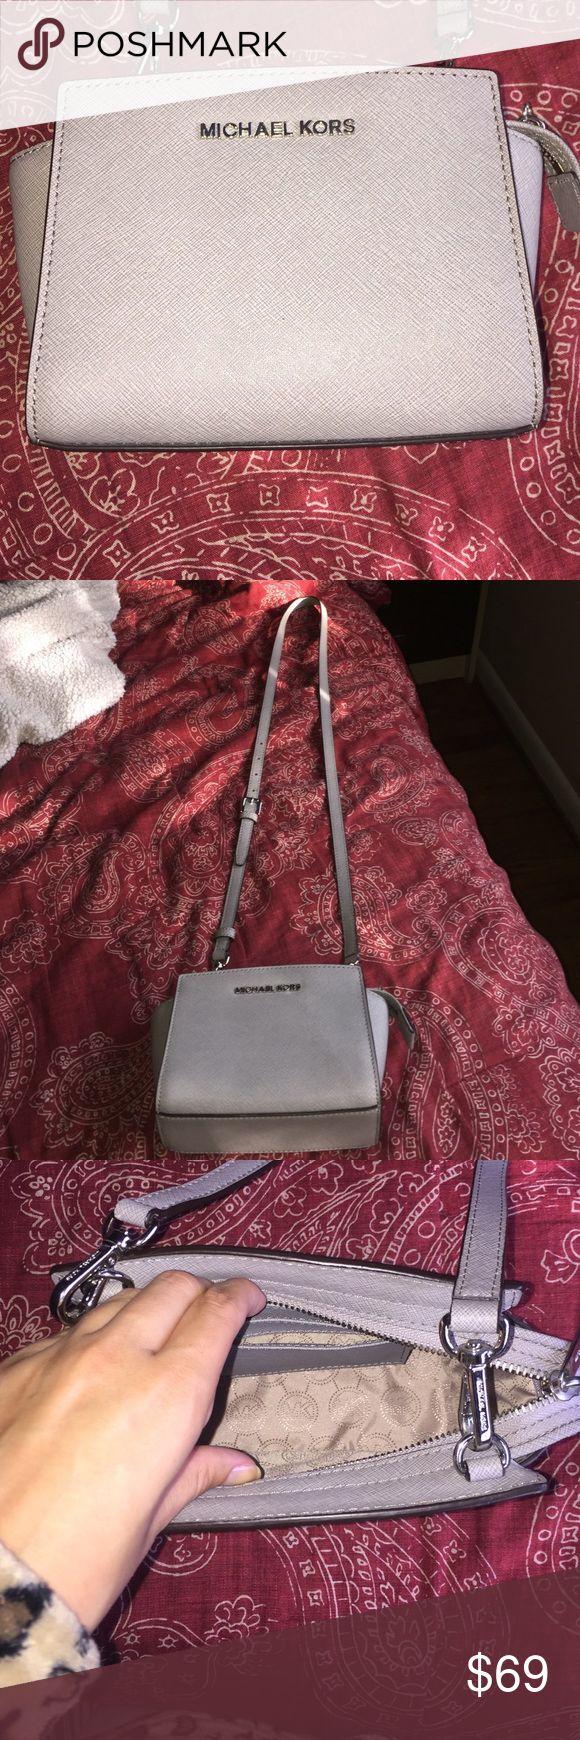 Michael kors grey pocketbook Never been worn, perfect condition michael kors pocketbook... adorable!!! Michael Kors Bags Crossbody Bags